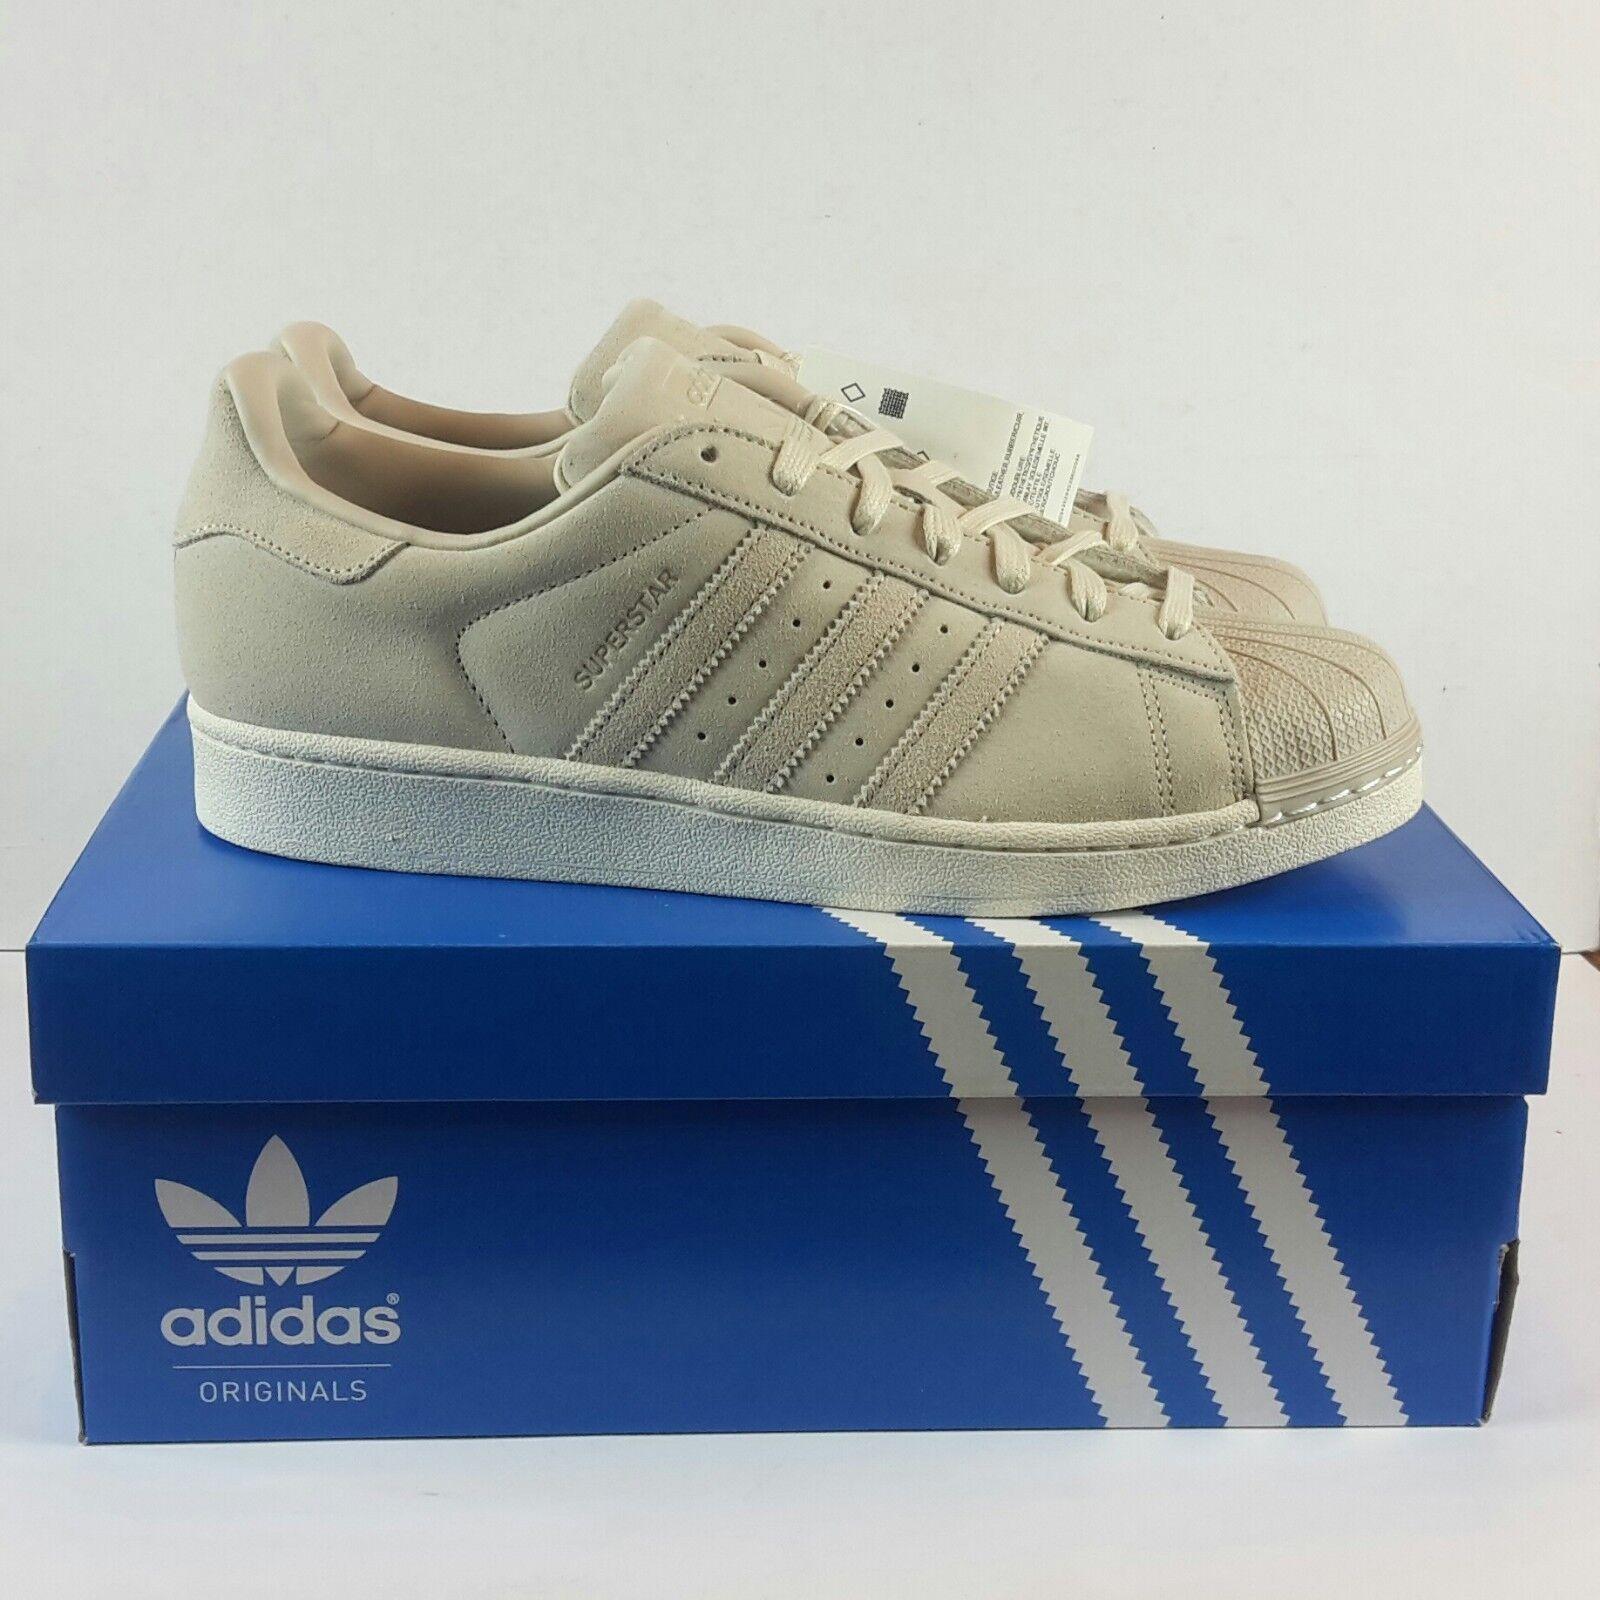 Adidas Originals Superstar Suede Clear Brown Men's Sneakers Comfortable